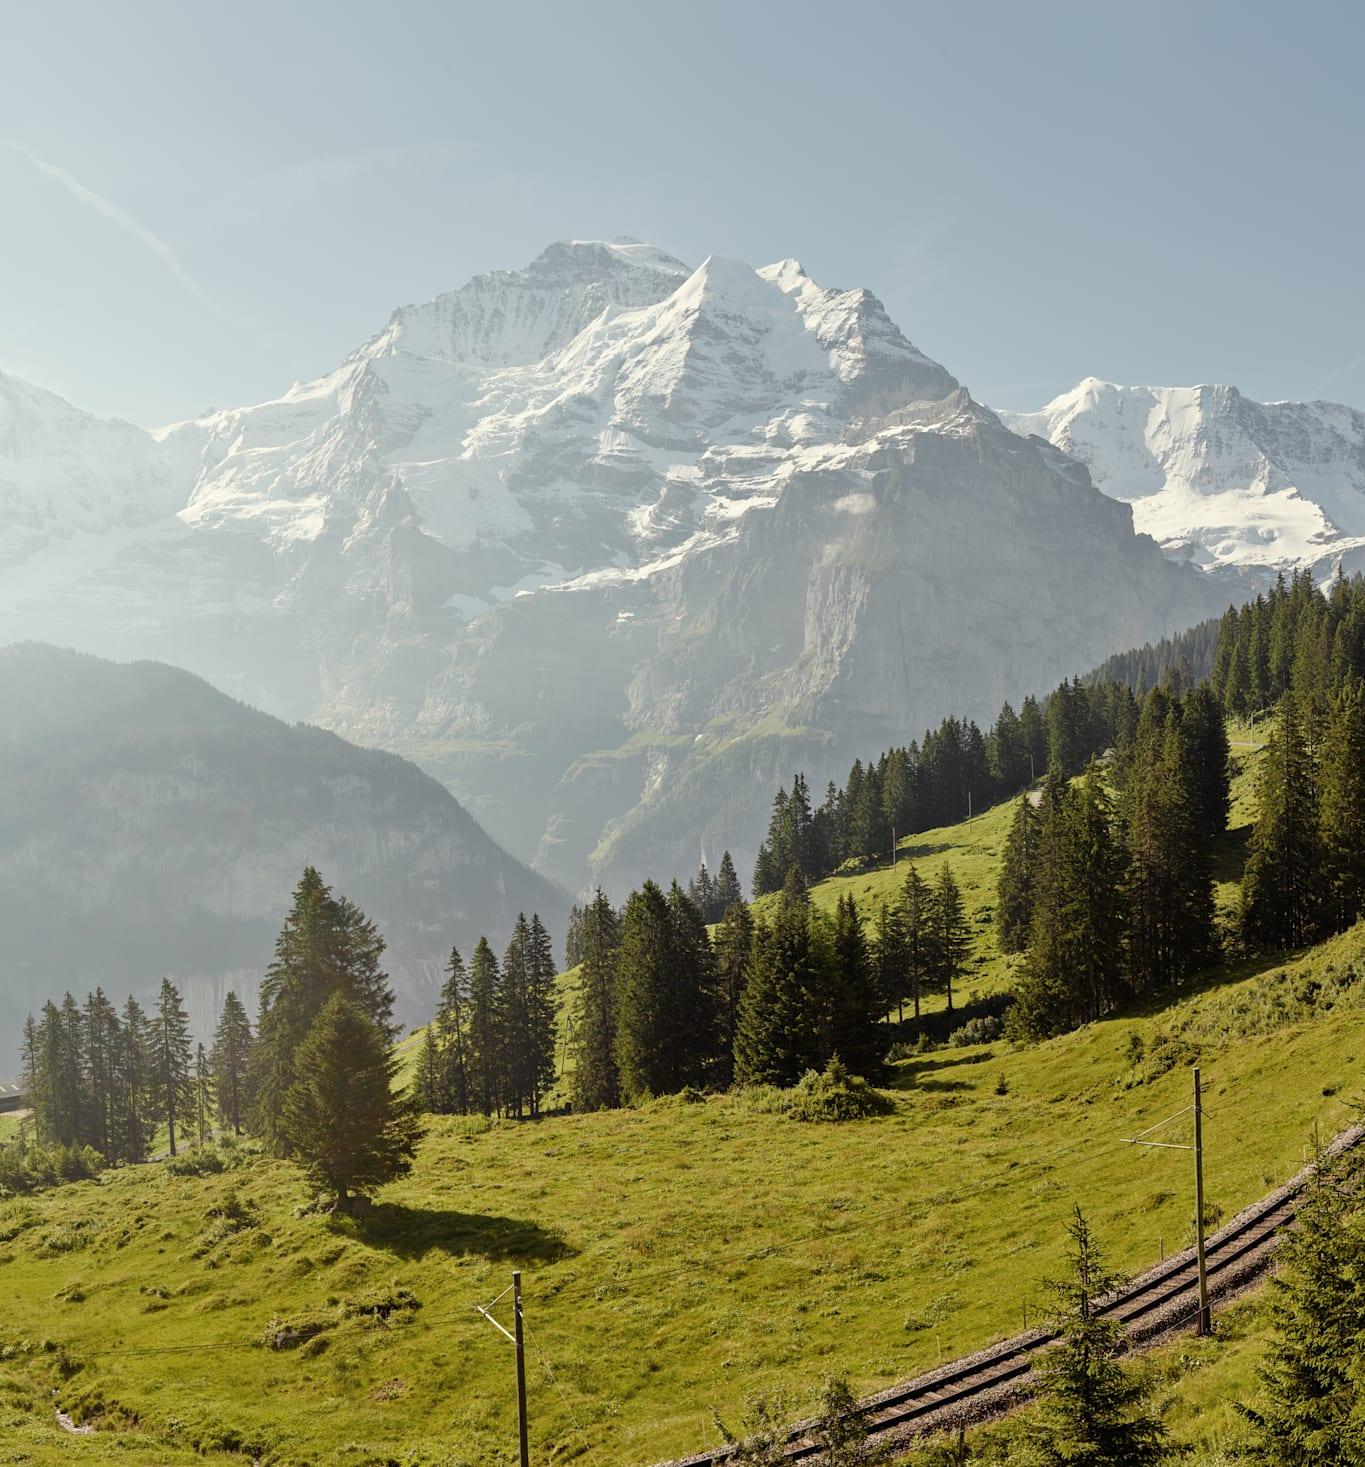 Winteregg Muerren Sommer Eiger Moench Jungfrau Panorama